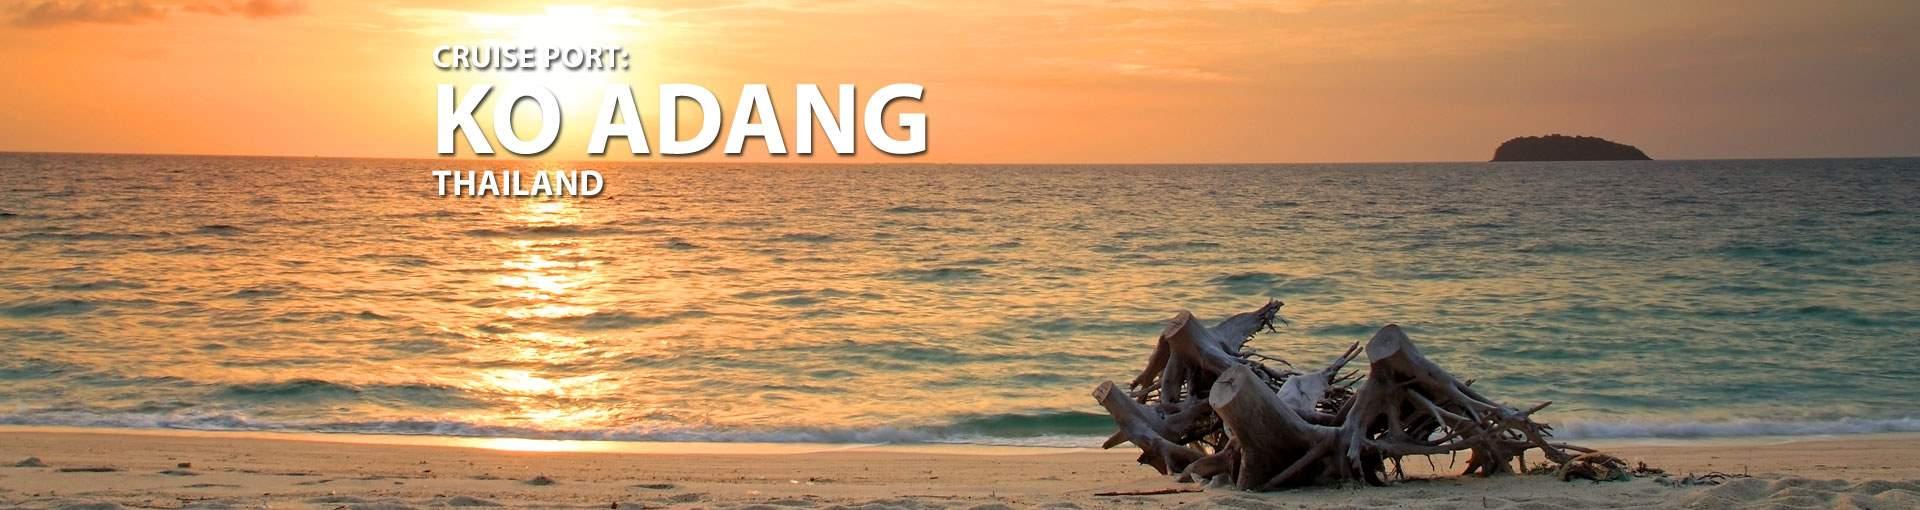 Cruises to Ko Adang, Thailand